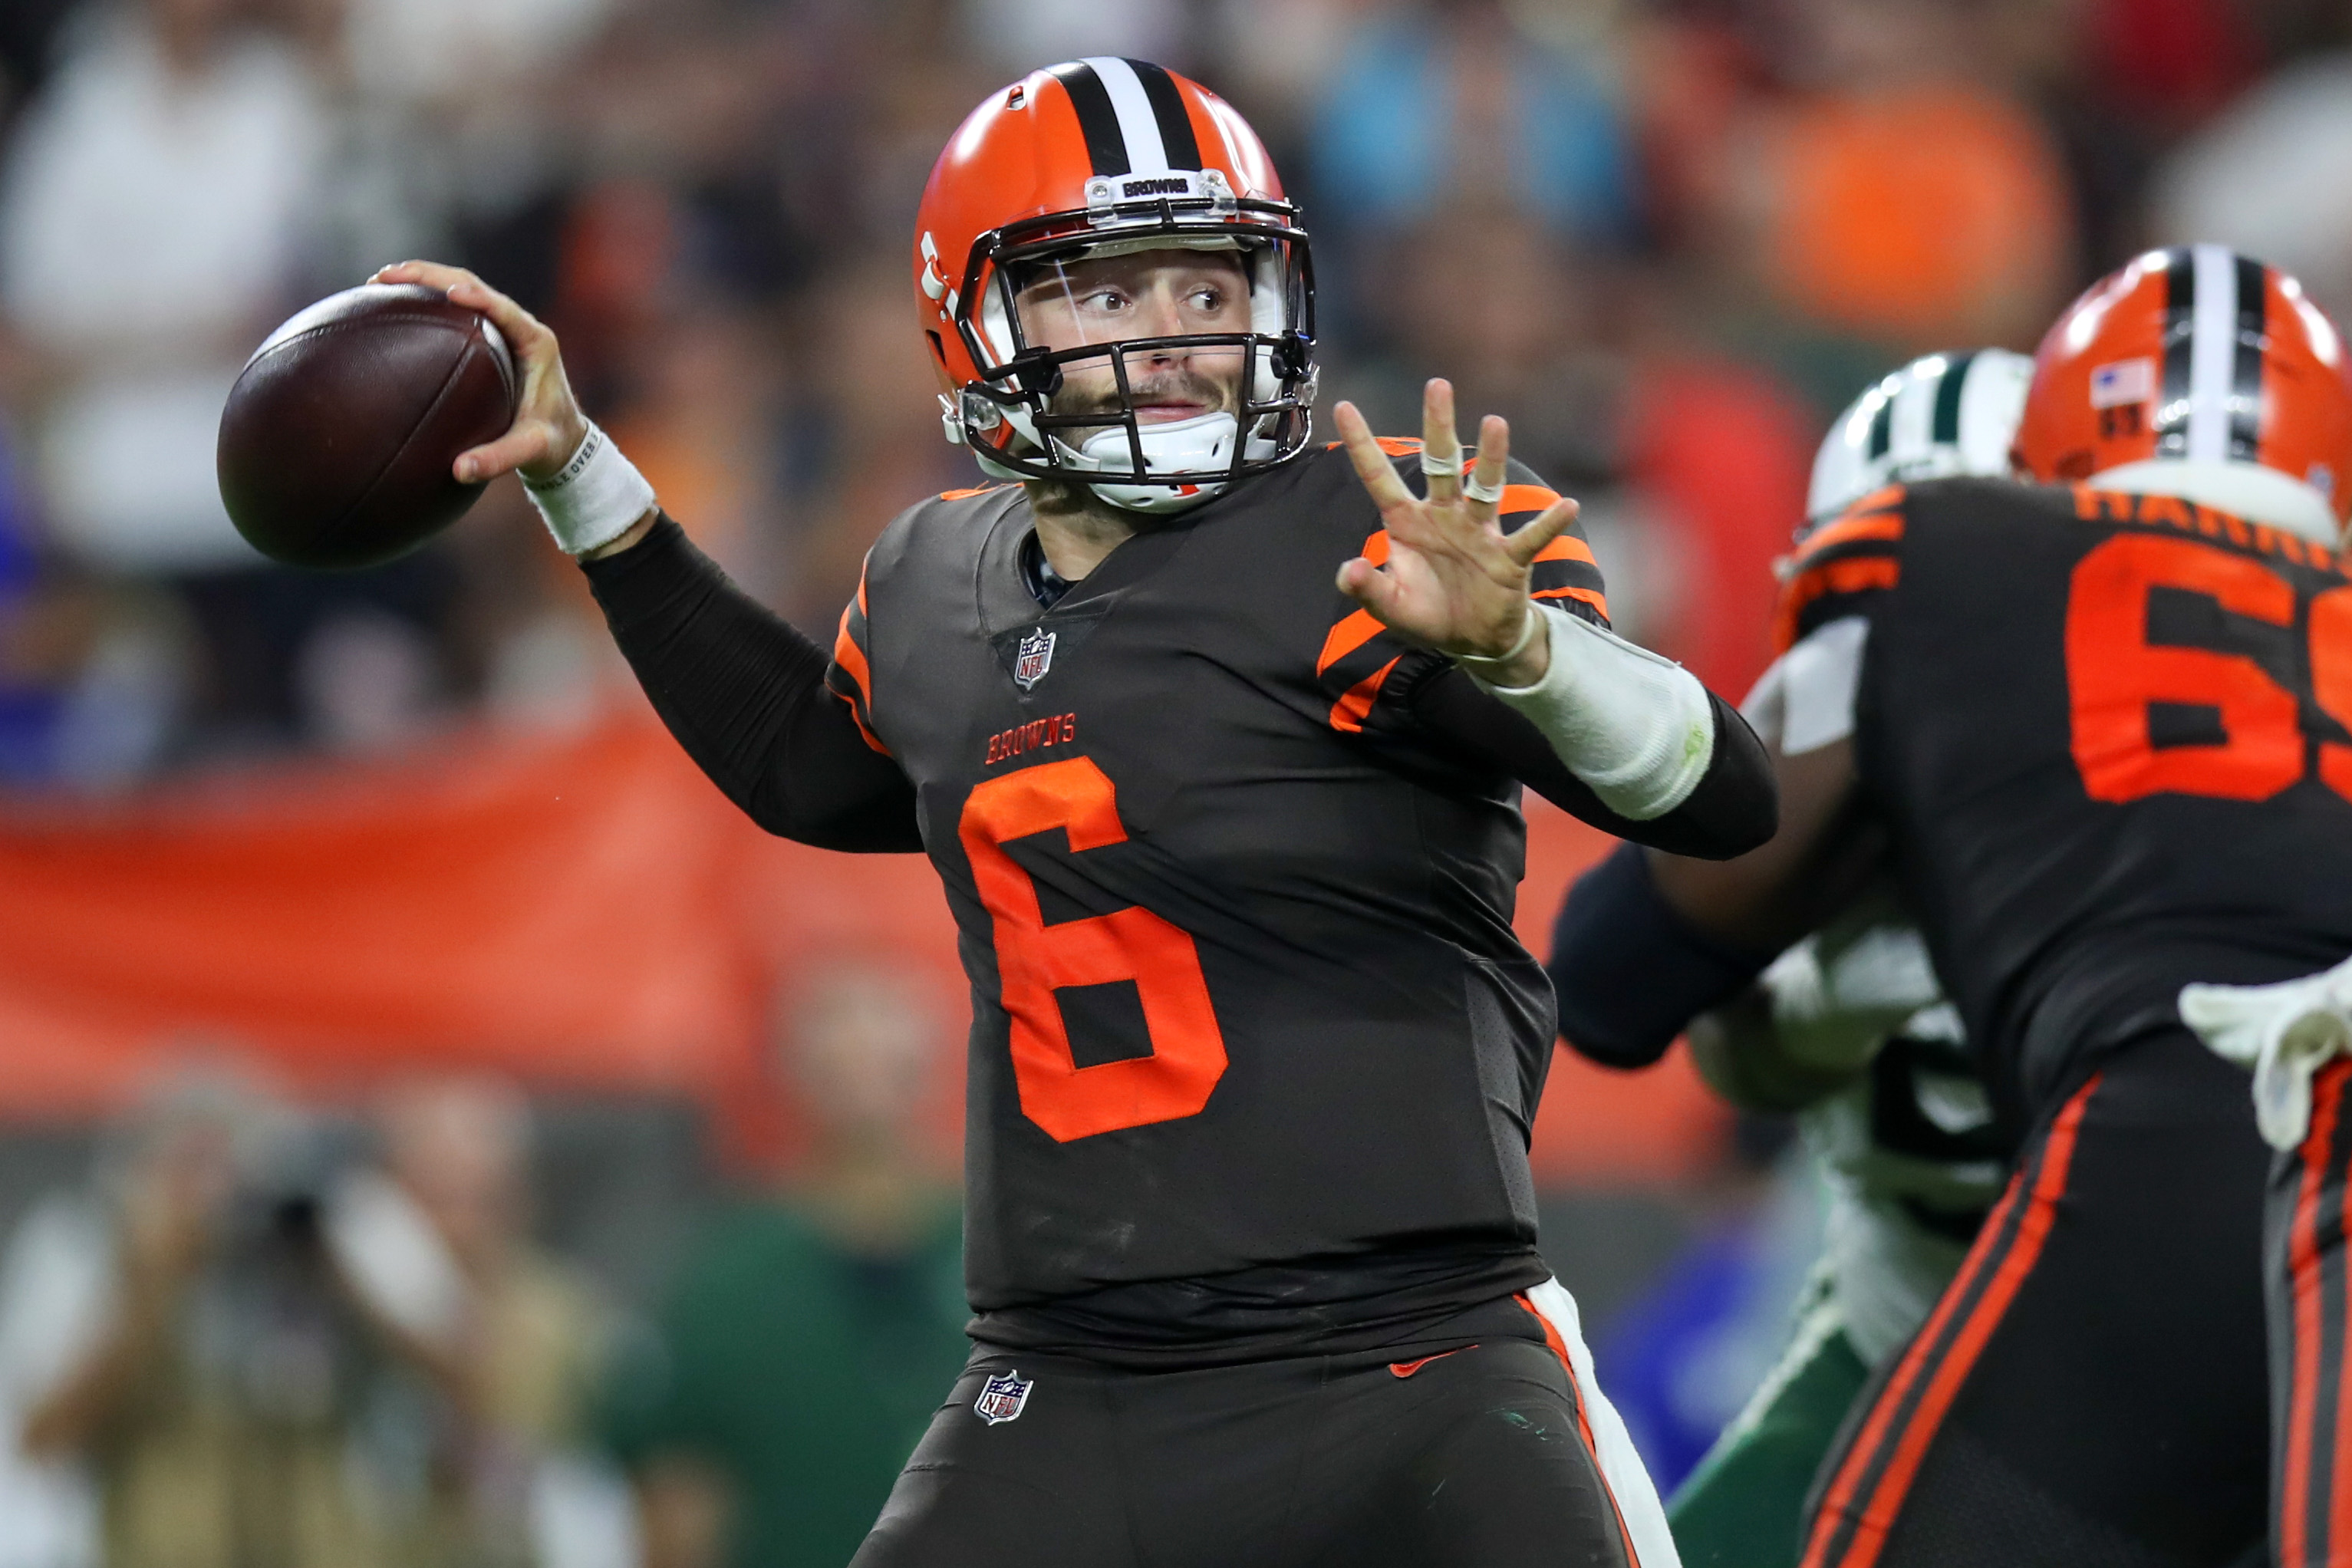 NFL: SEP 20 Jets at Browns